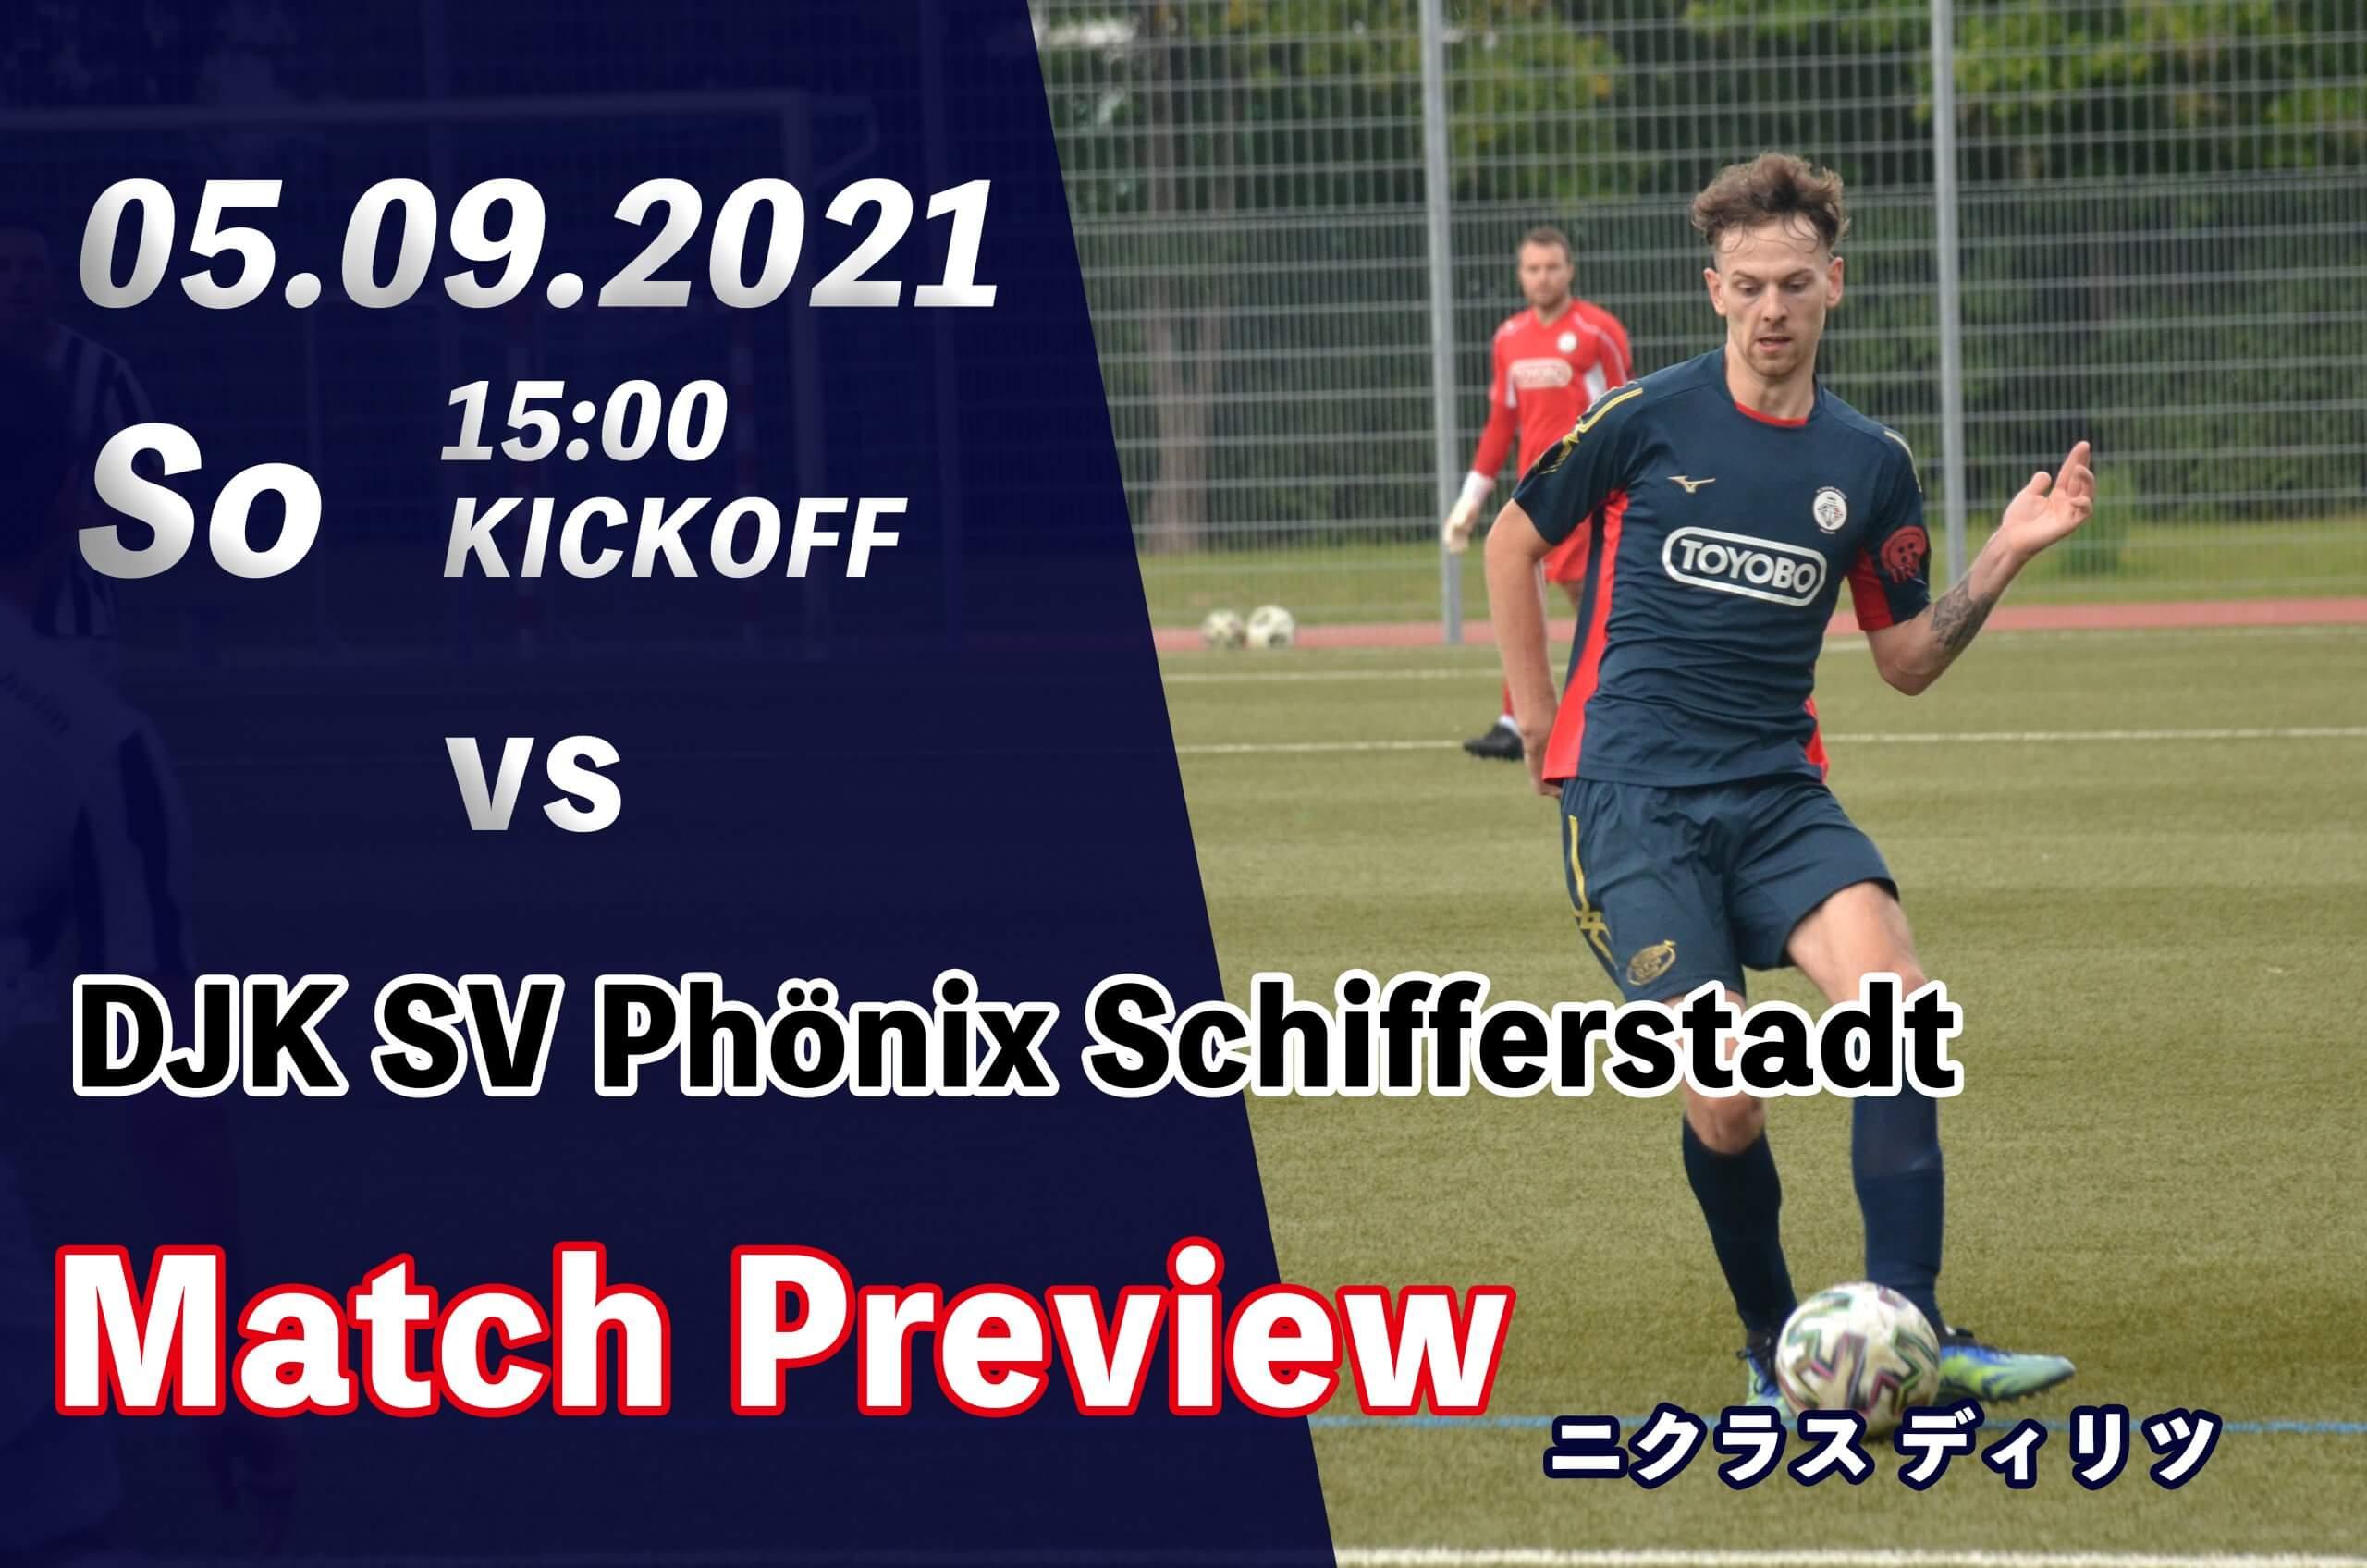 【マッチプレビュー 第4節 vs DJK SV Phönix Schifferstadt】